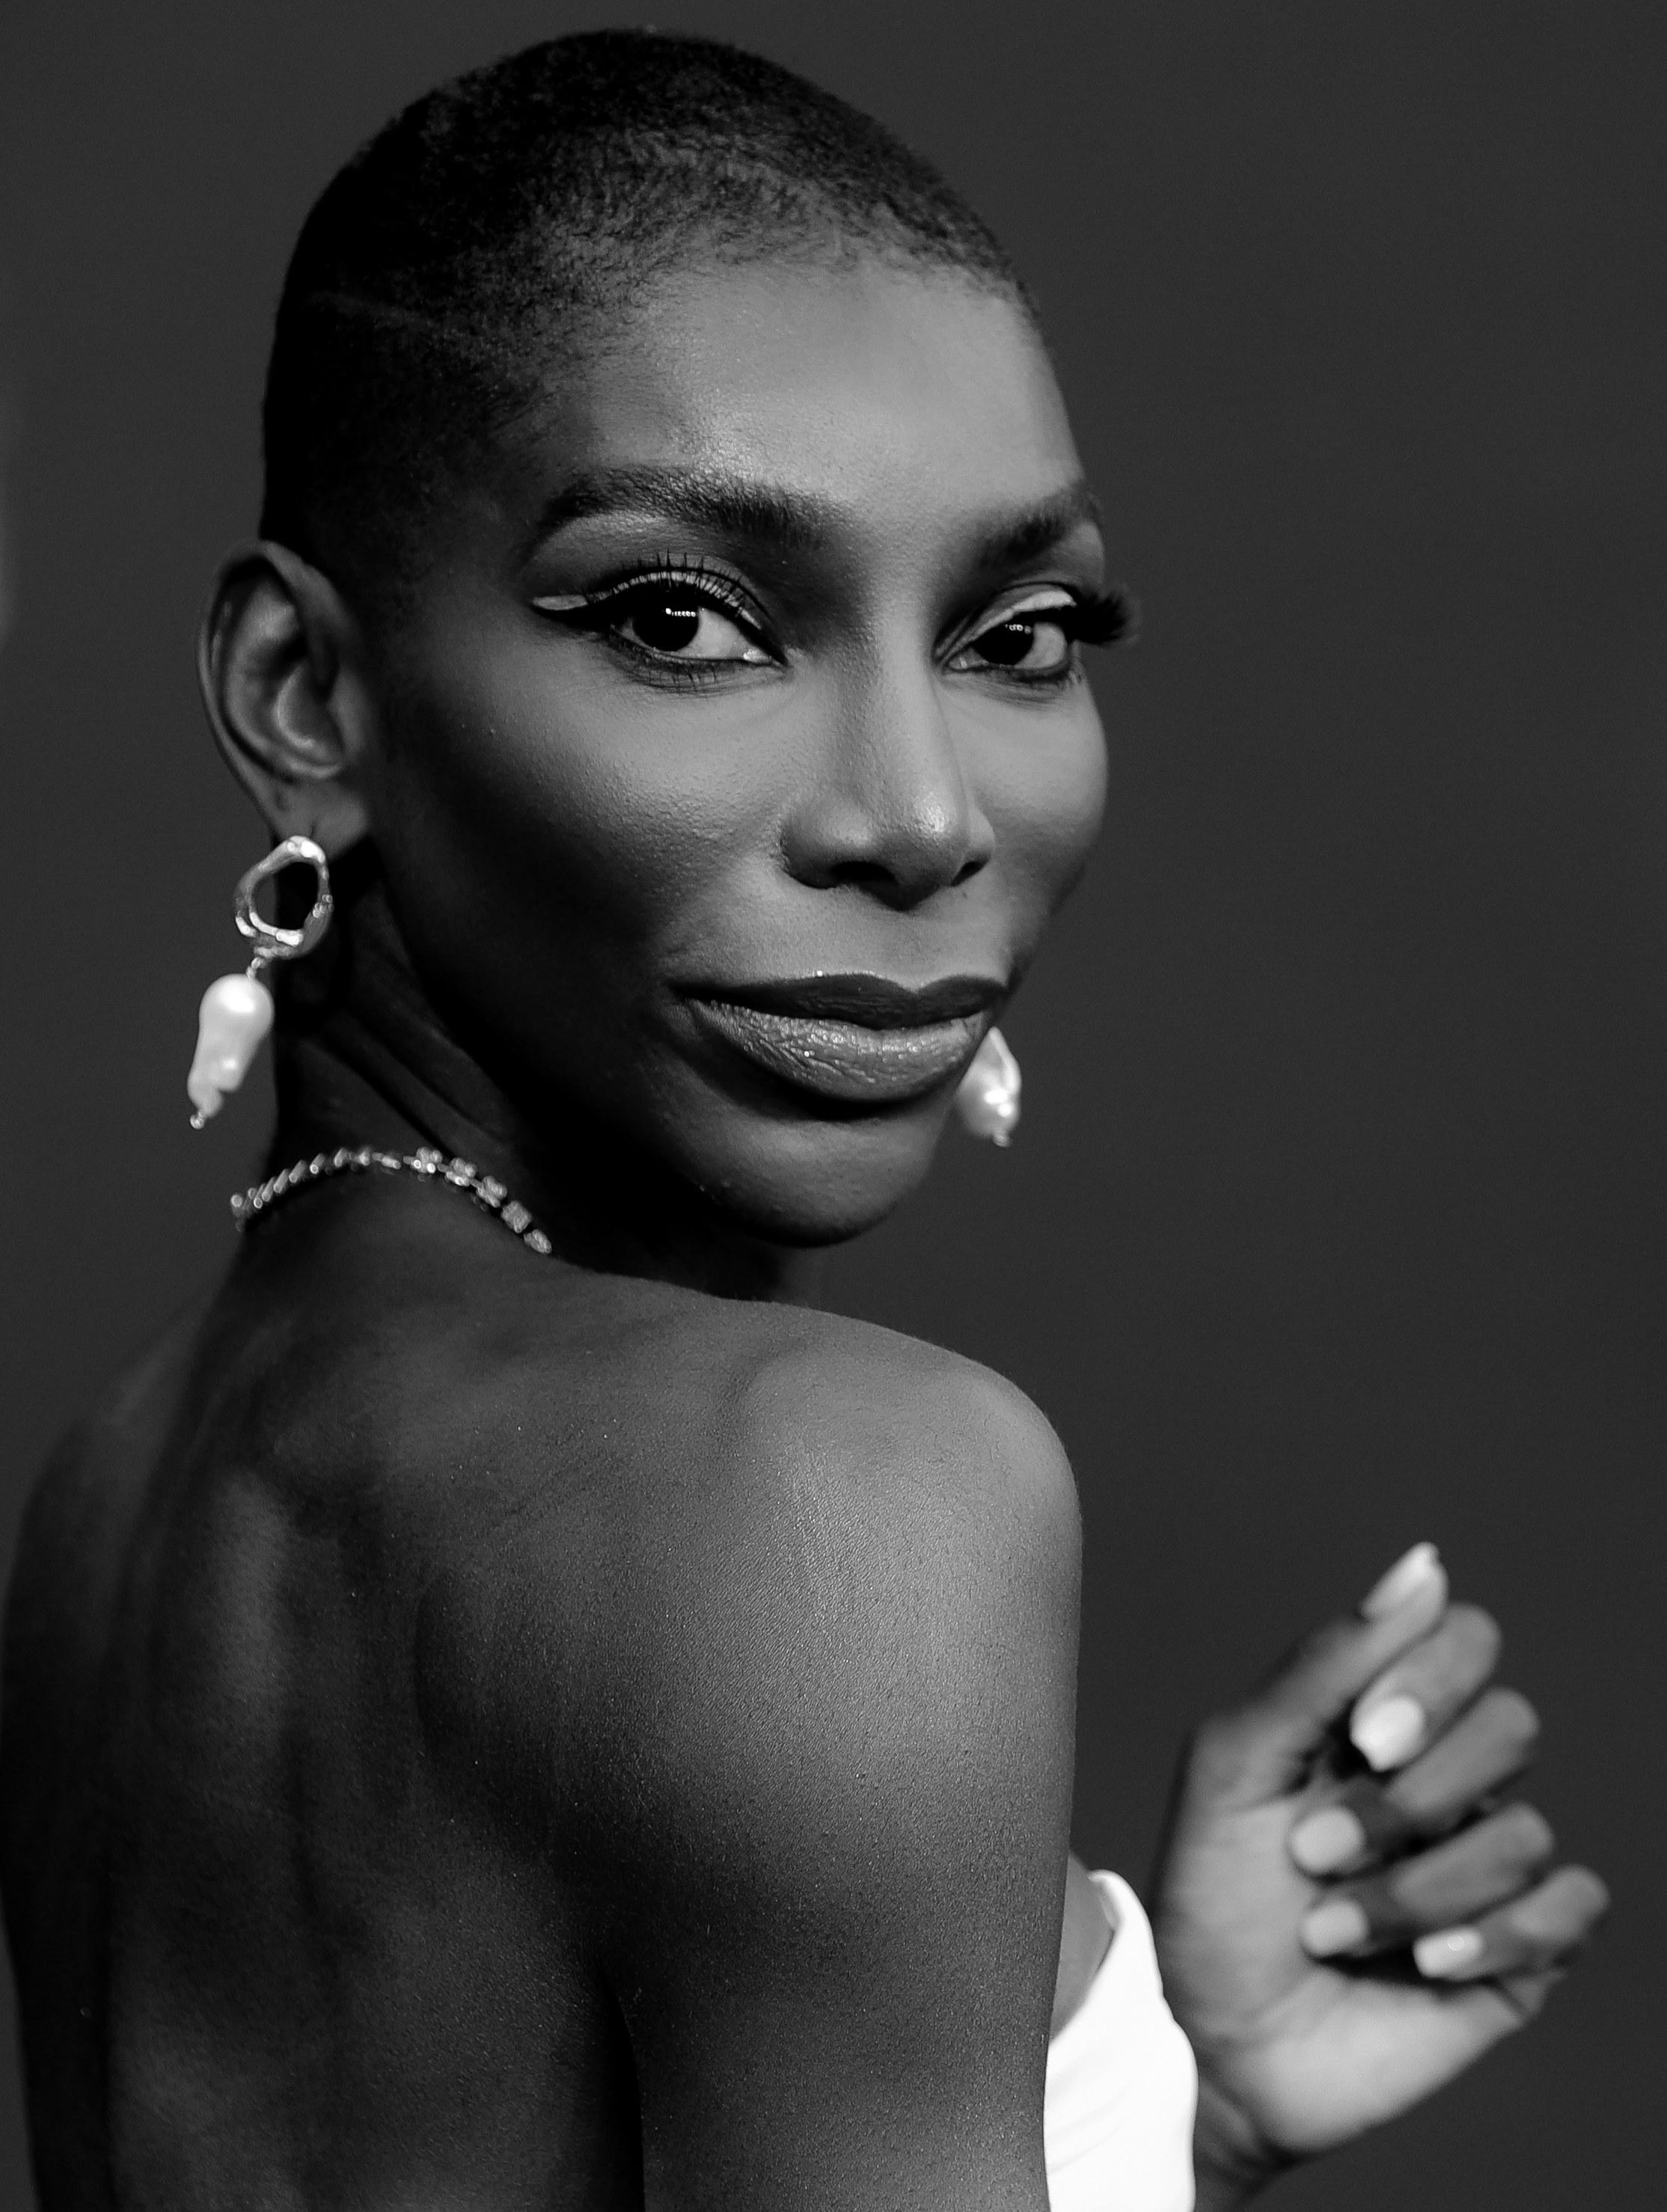 Black-and-white photo of Michaela